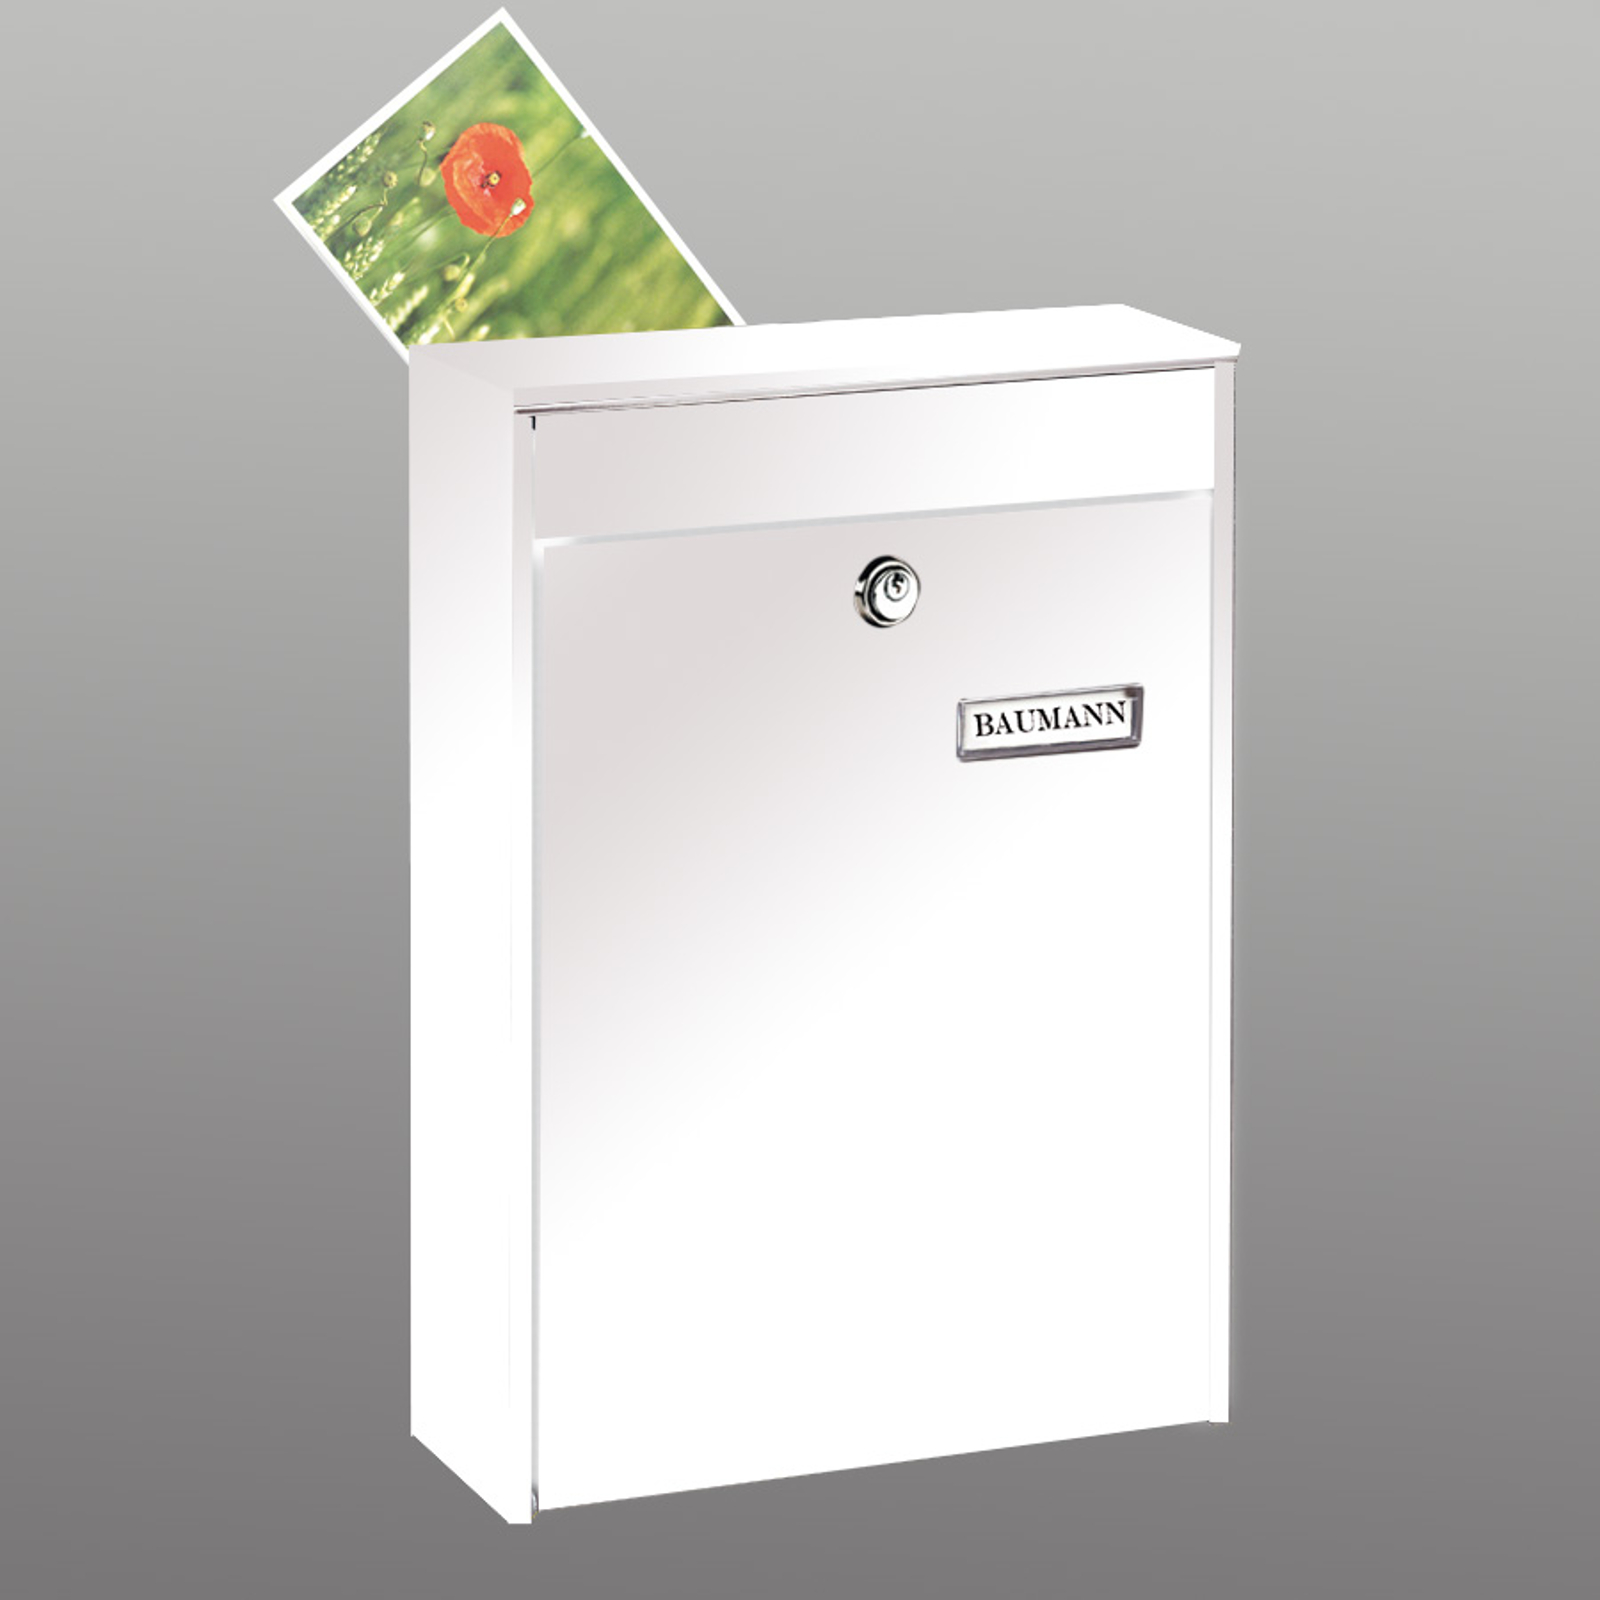 LEIPZIG 778 postkasse i højformat, hvid